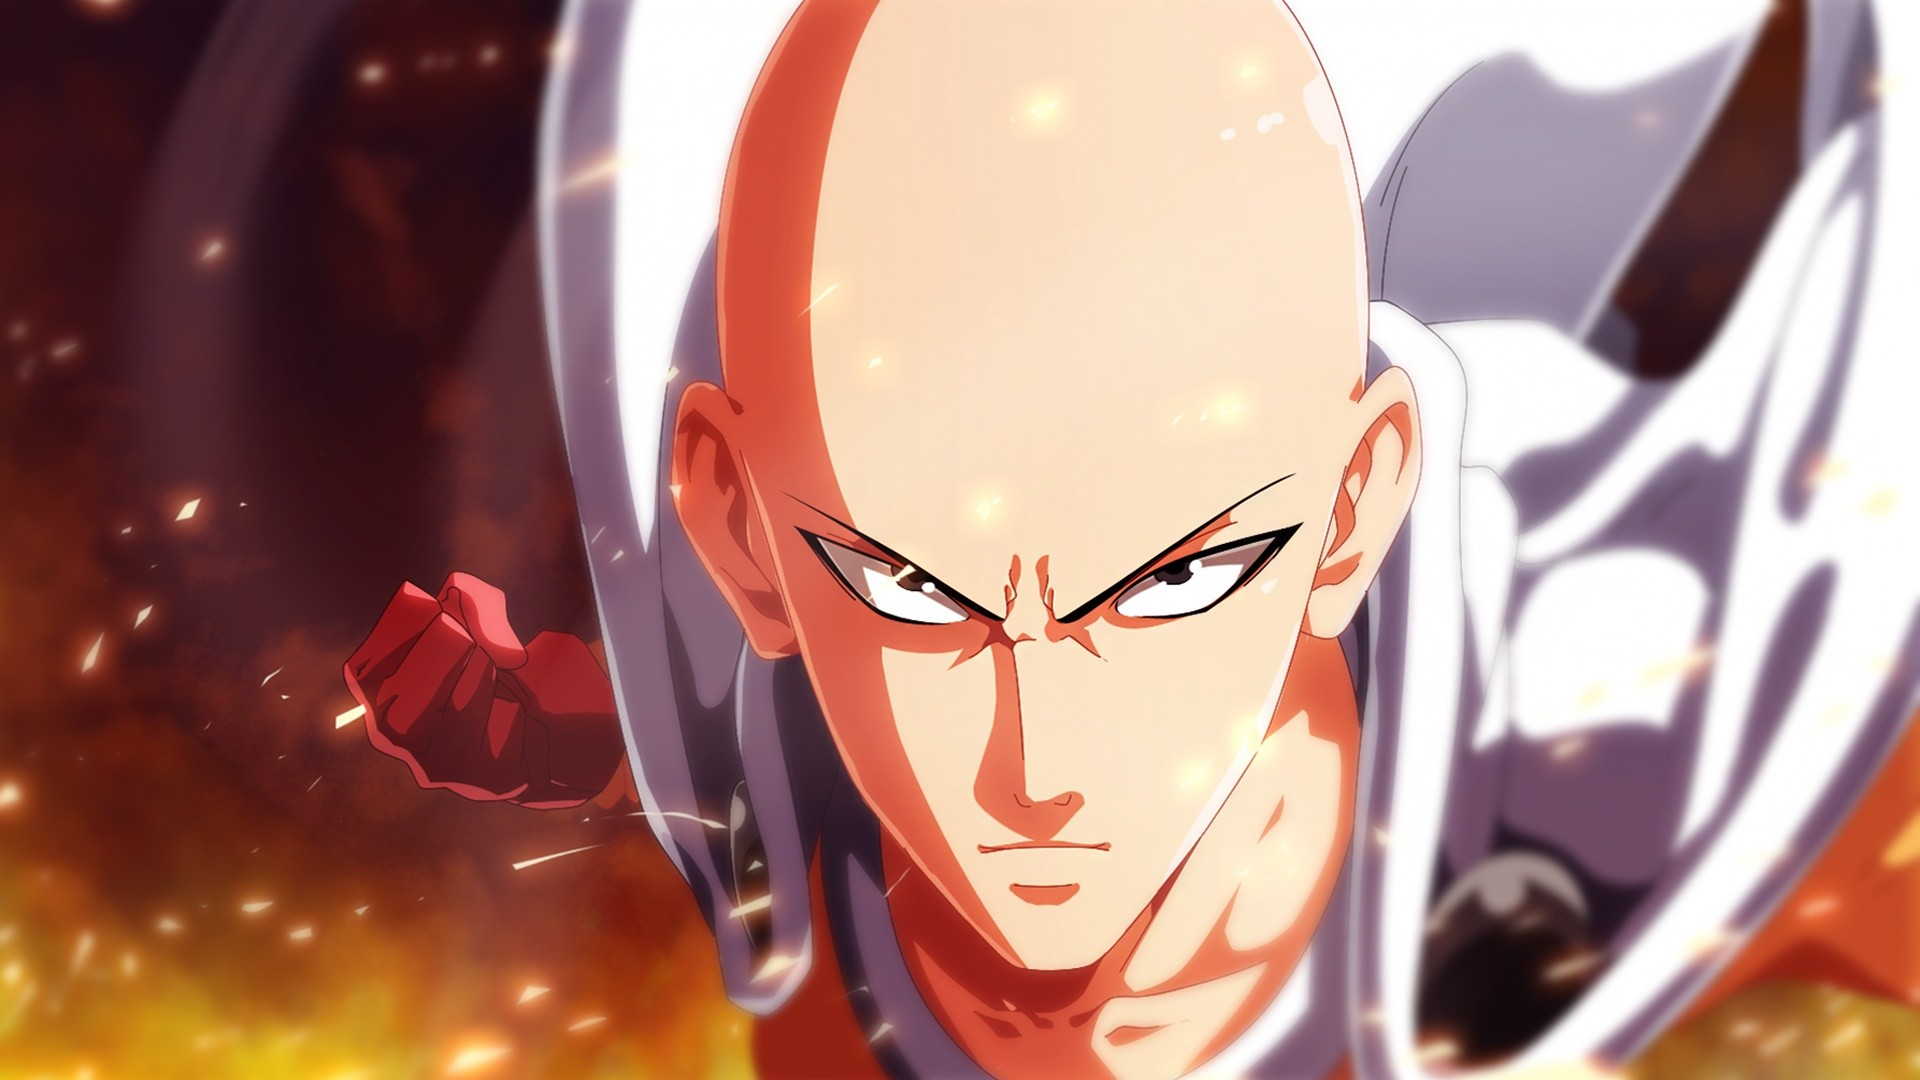 Anime 1920x1080 One-Punch Man Saitama anime